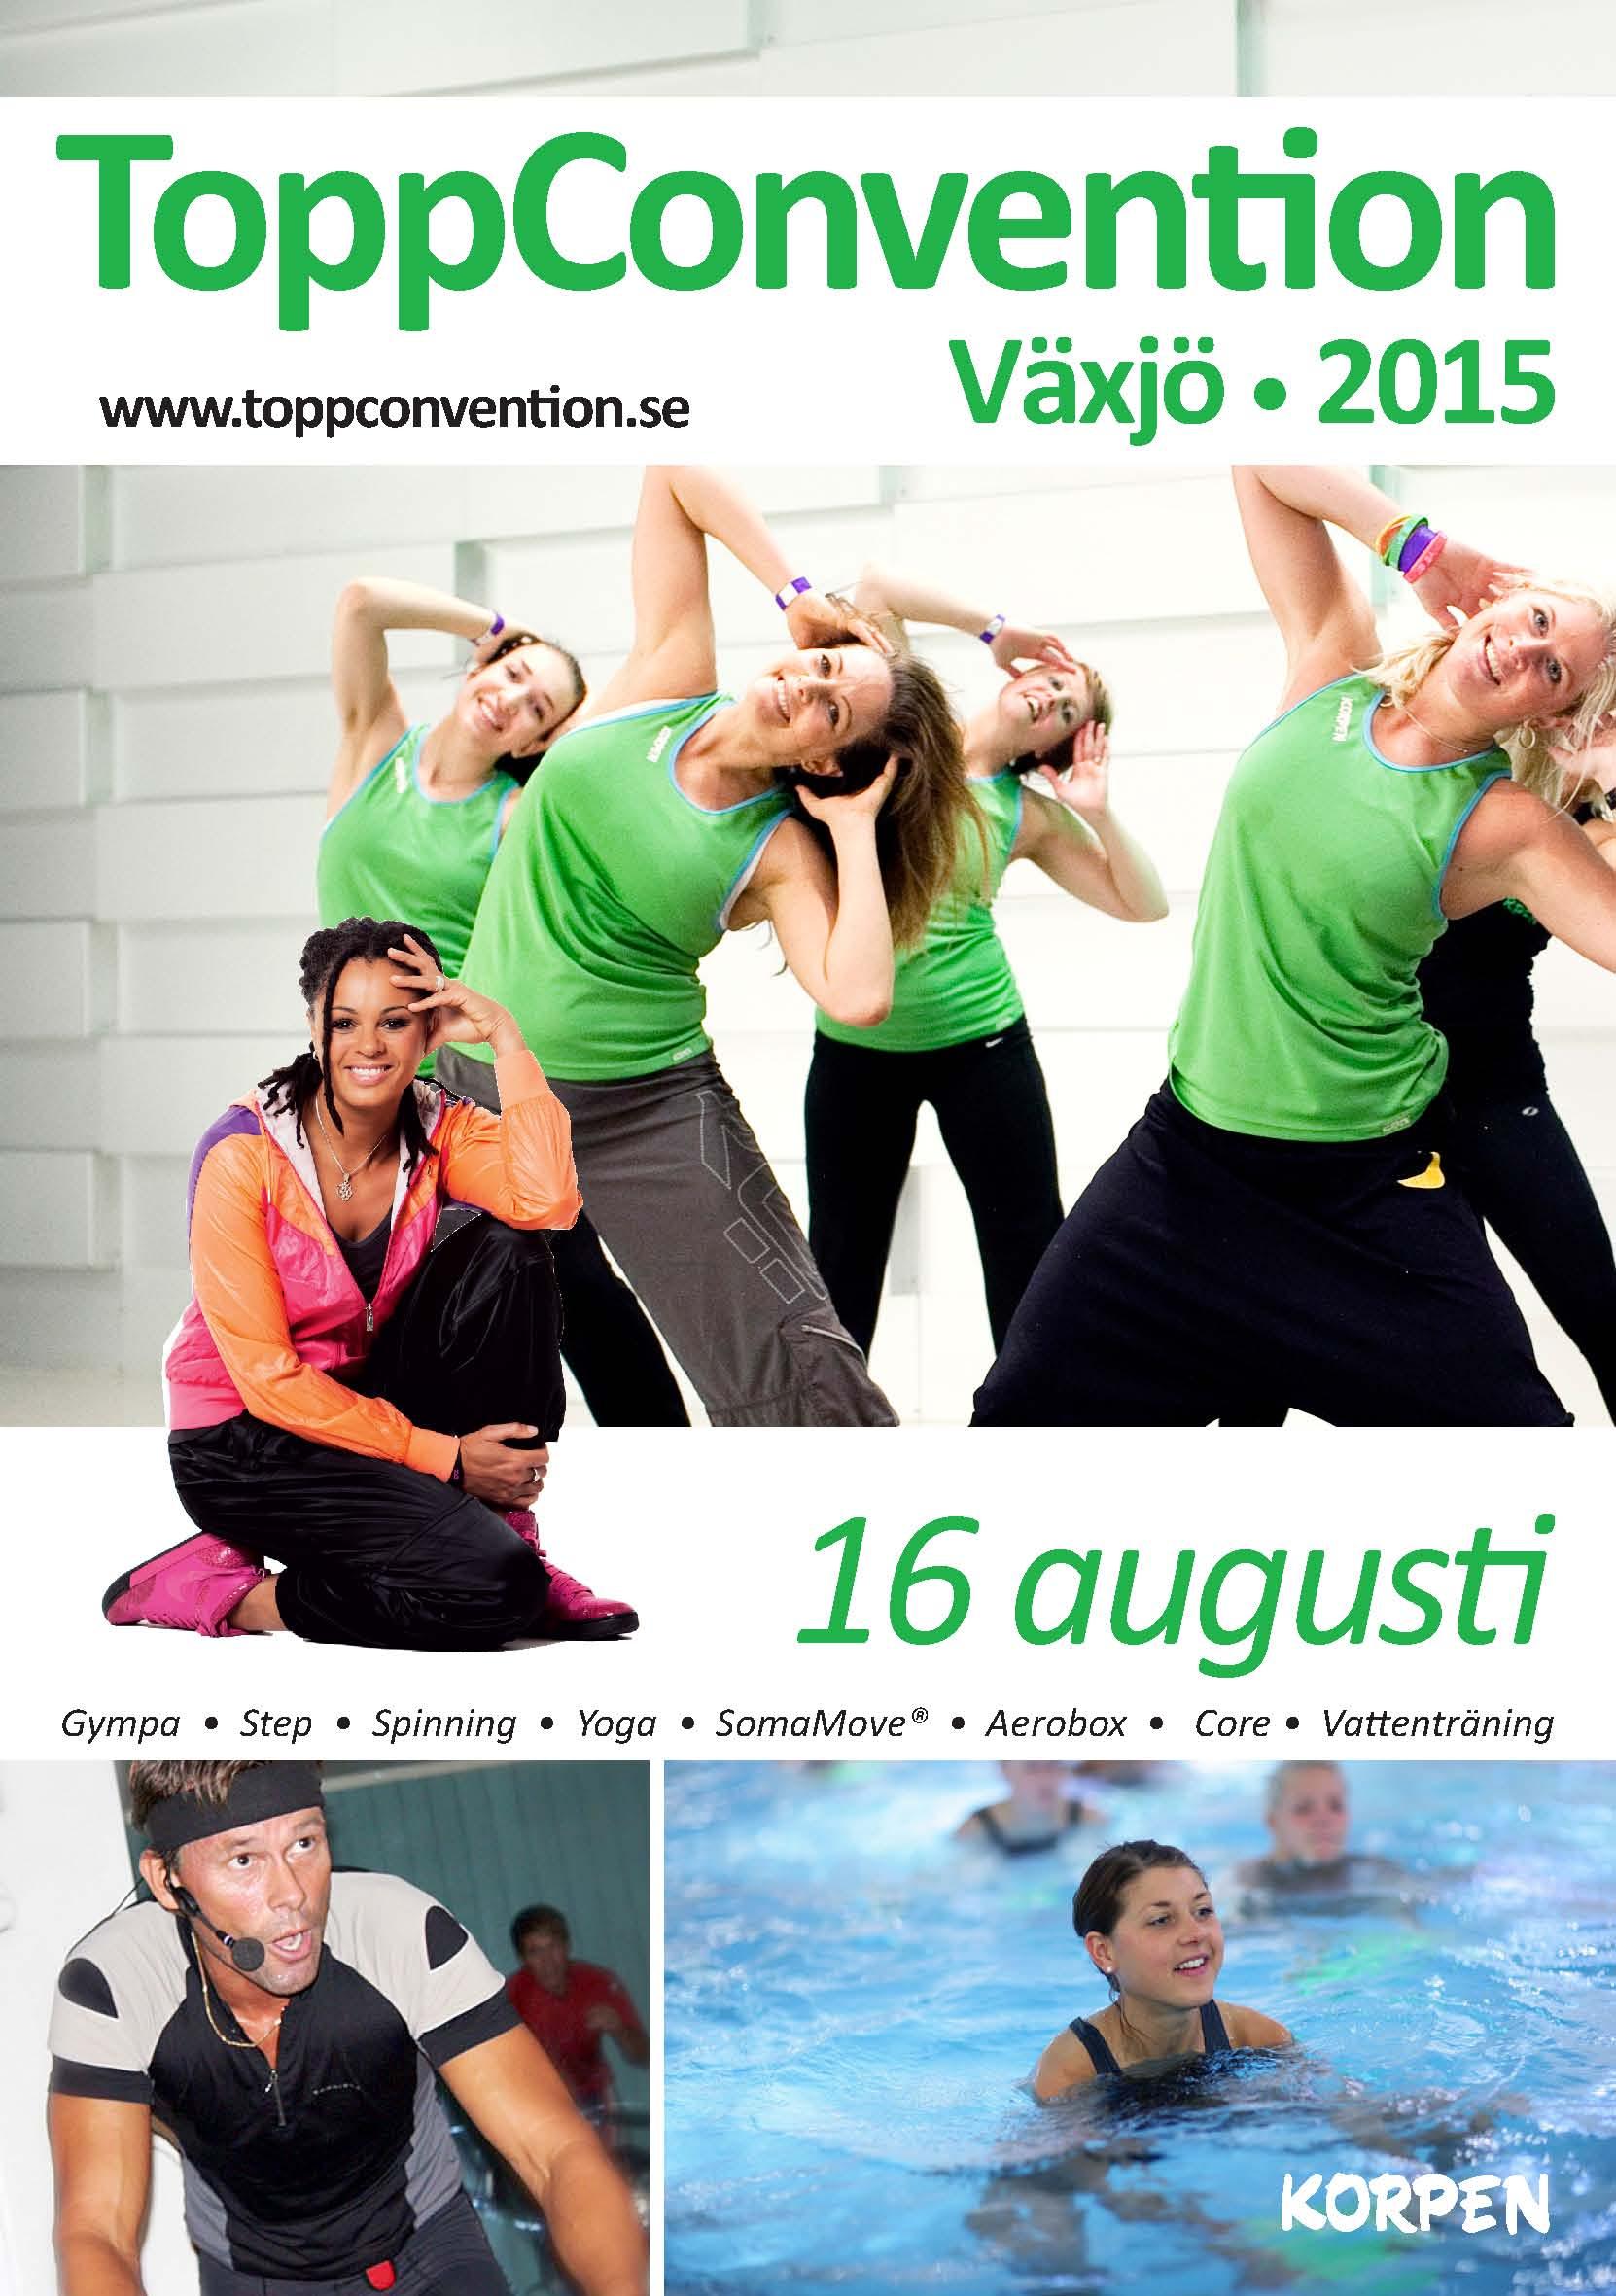 ToppConventio Inbjudan 16 aug 2015_Page_1